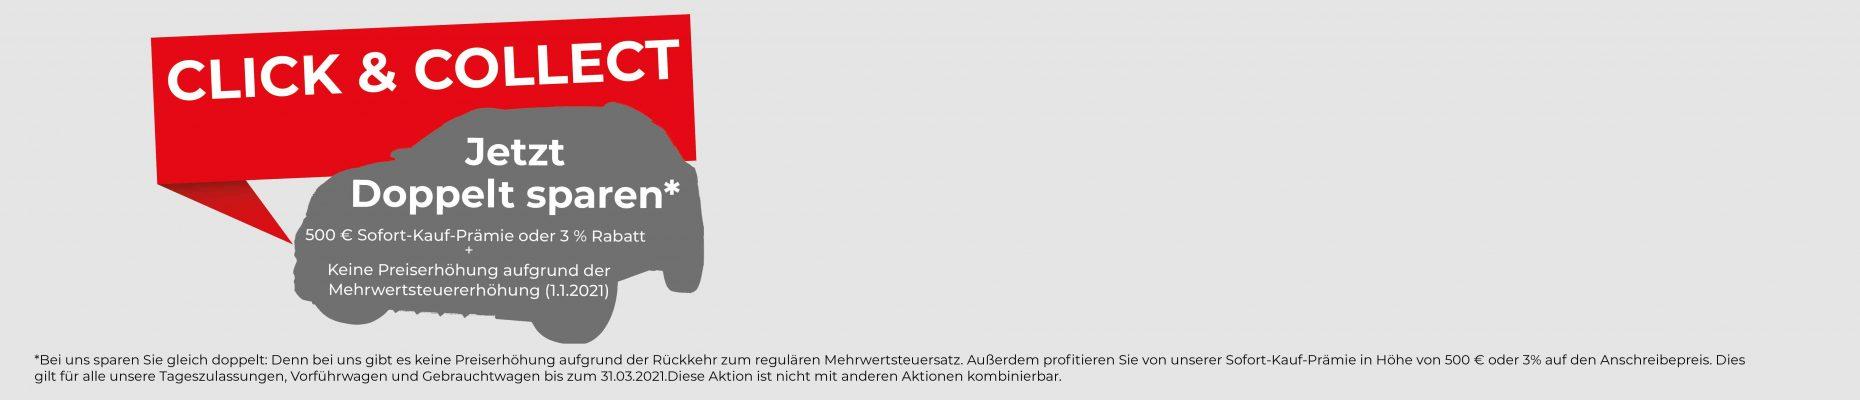 1864x400_Doppeltsparen_Auto_Satz